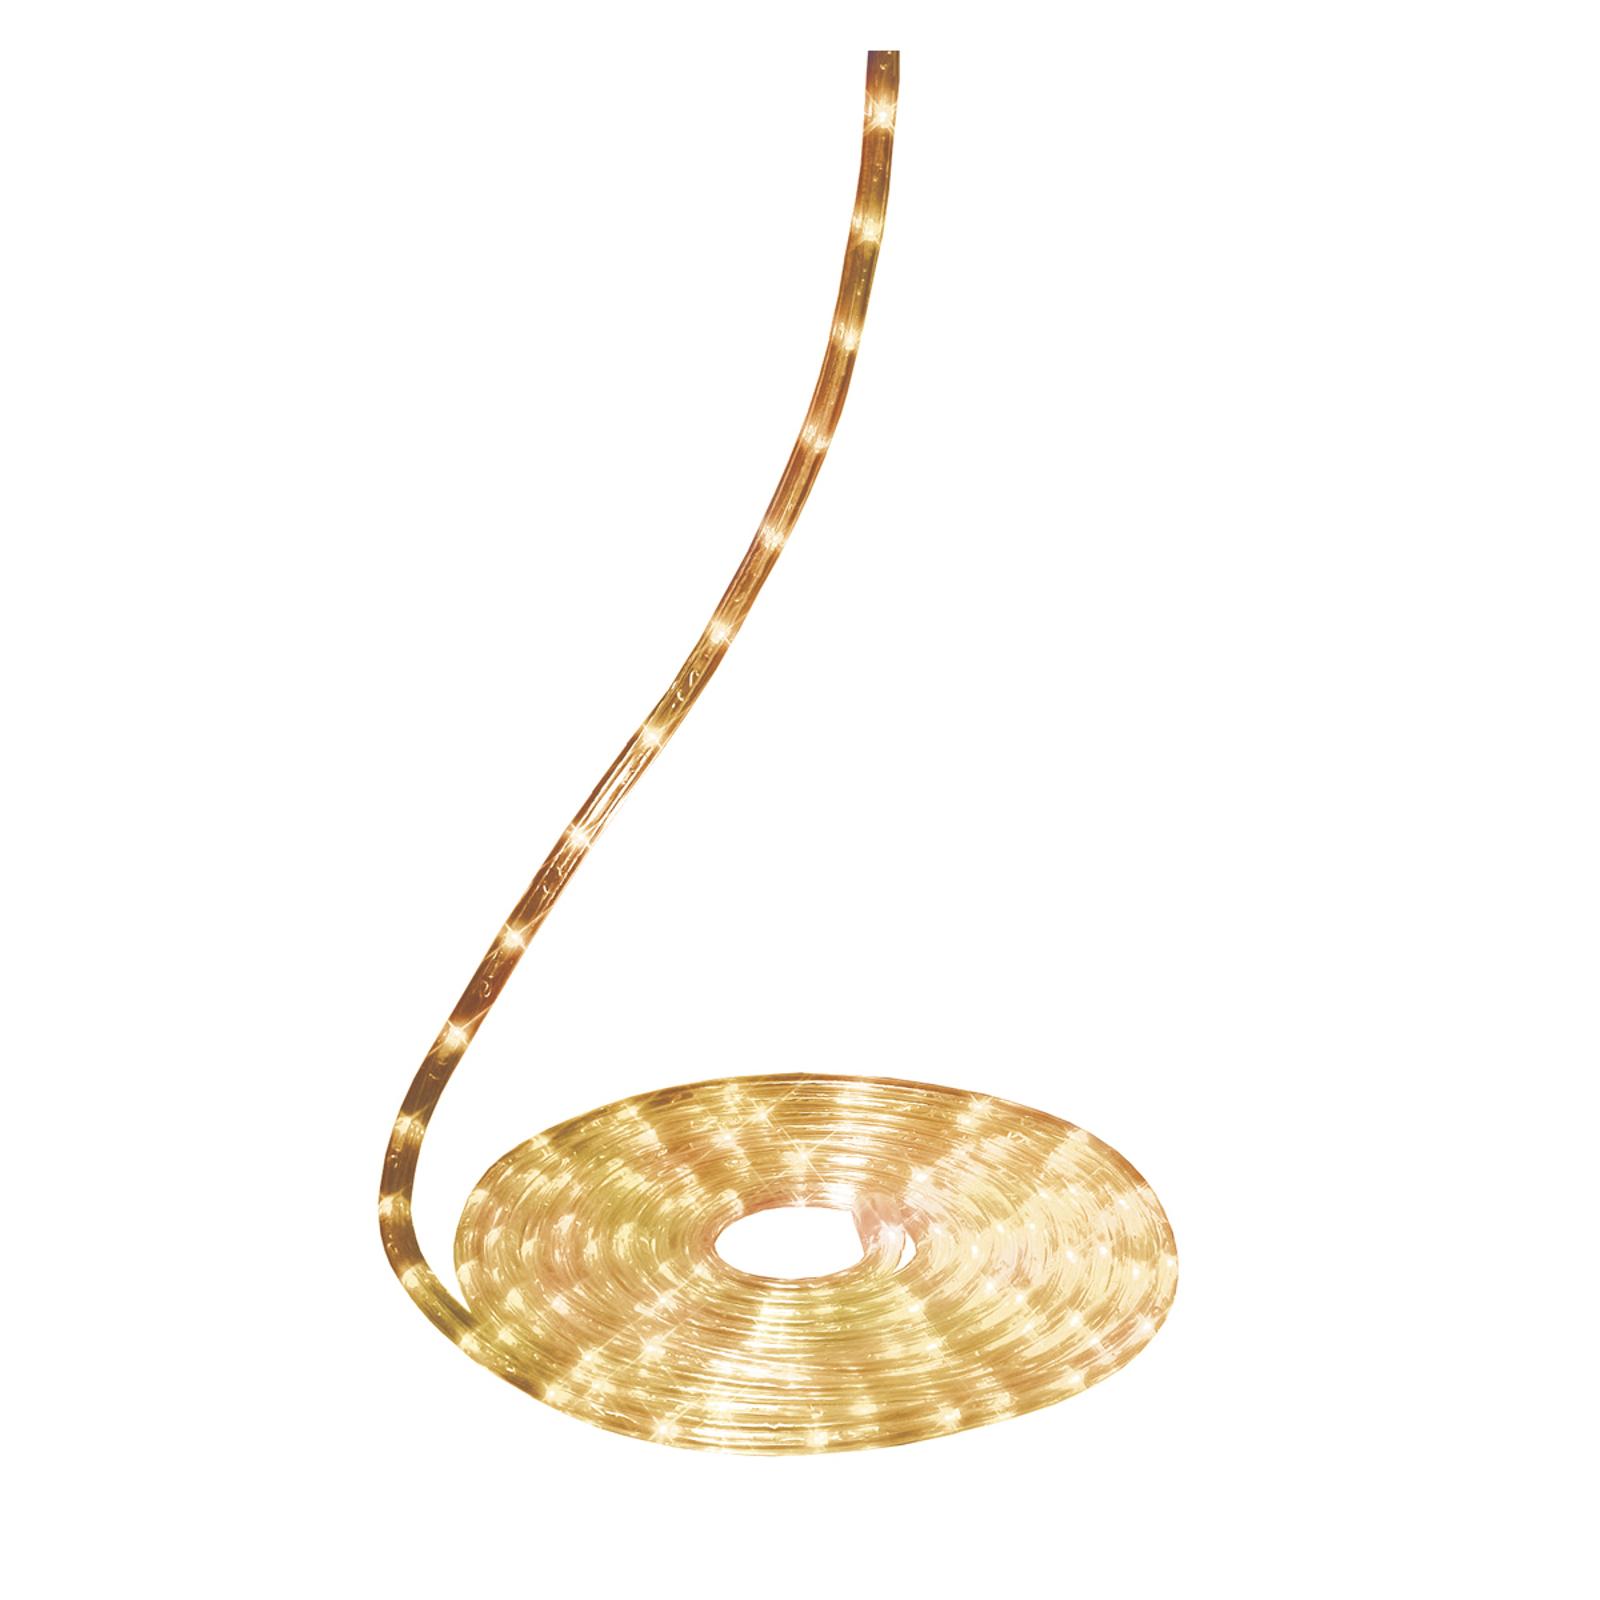 Micro svetelná hadica Ropelight 6 metrová číra_1522643_1